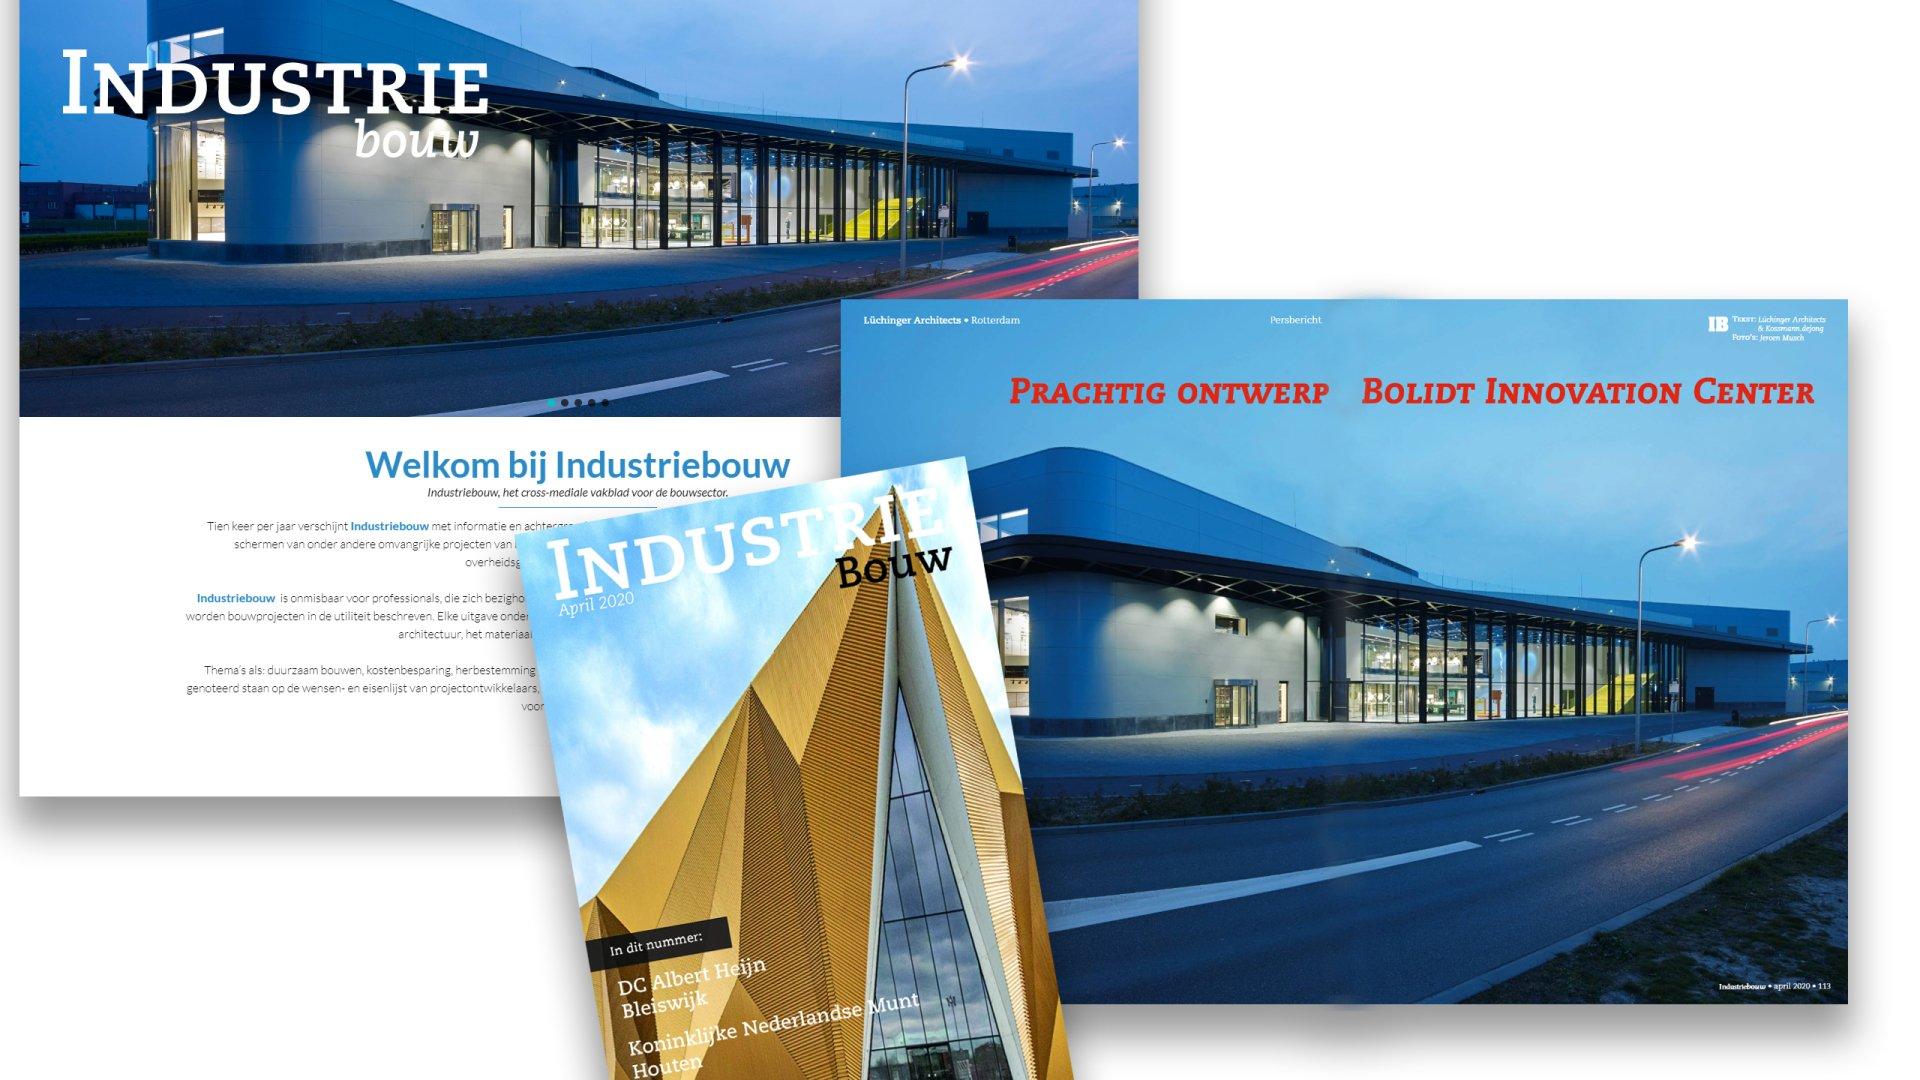 IndrustrieBouw-artikel Bolidt Innovation Center